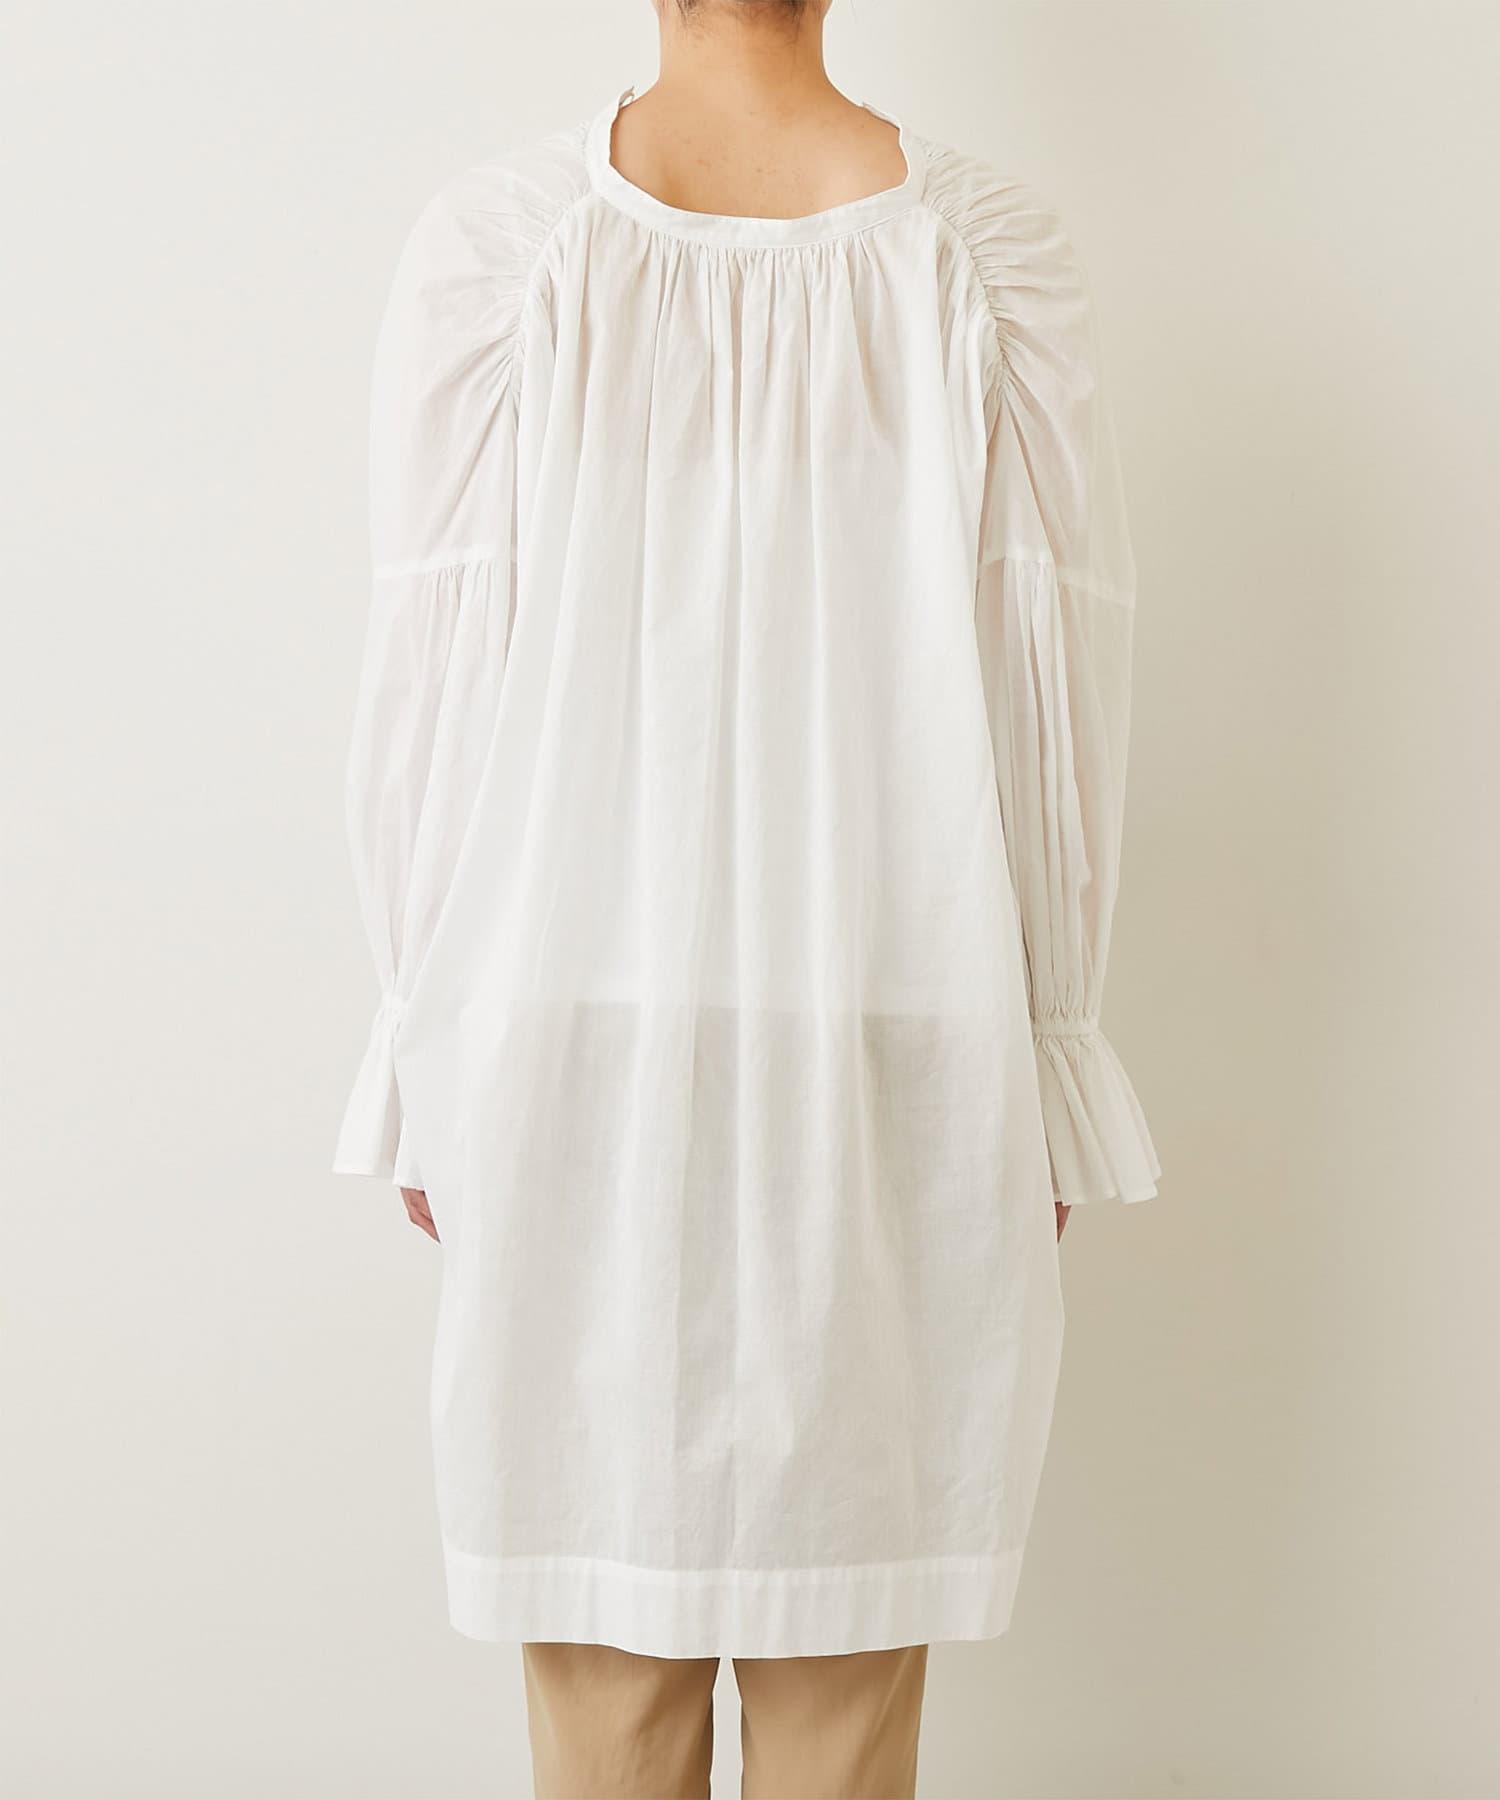 GALLARDAGALANTE(ガリャルダガランテ) バックロングプルオーバーシャツ